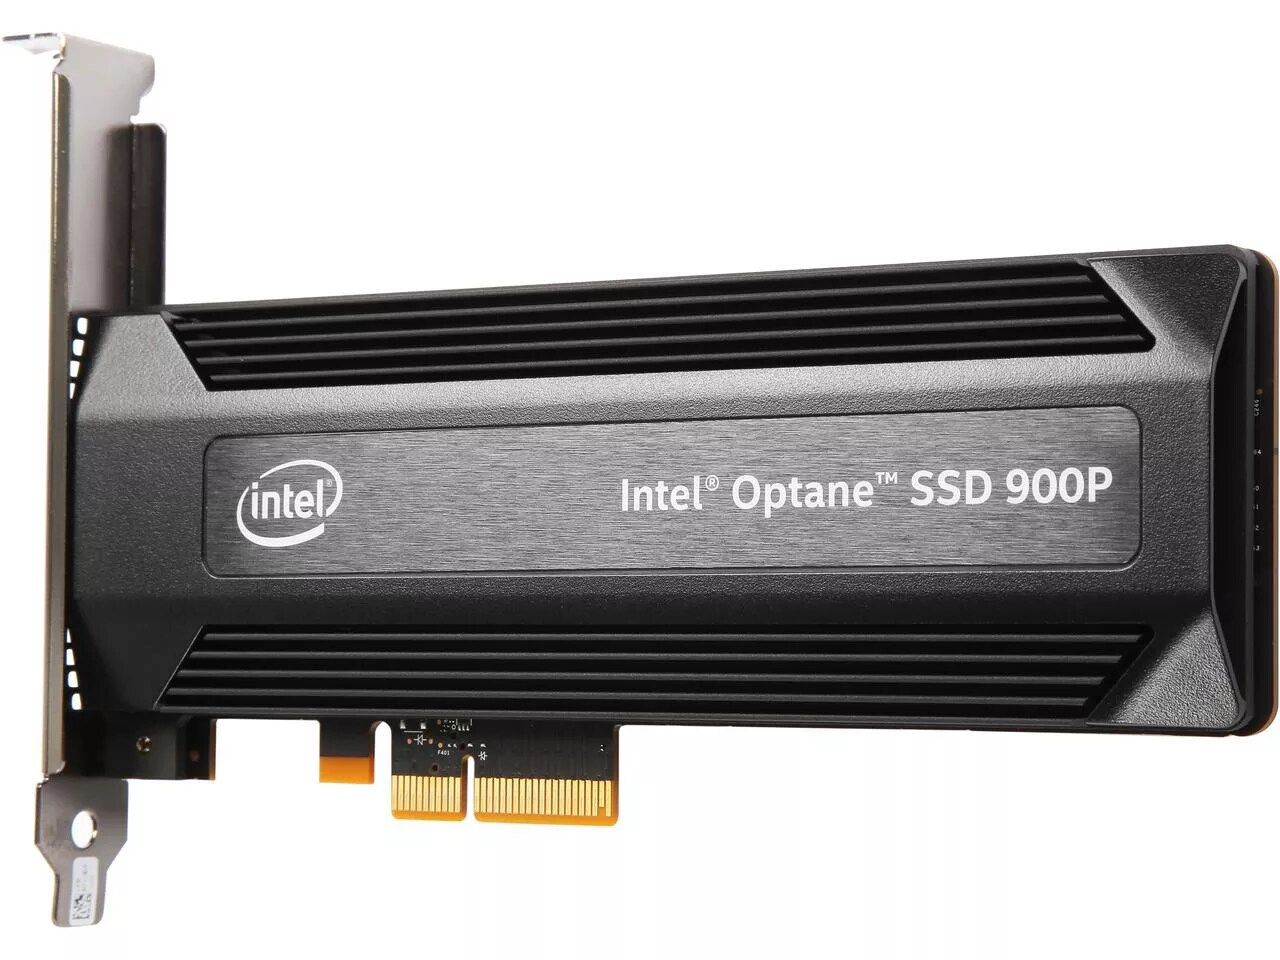 intel optane ssd 900p (1)